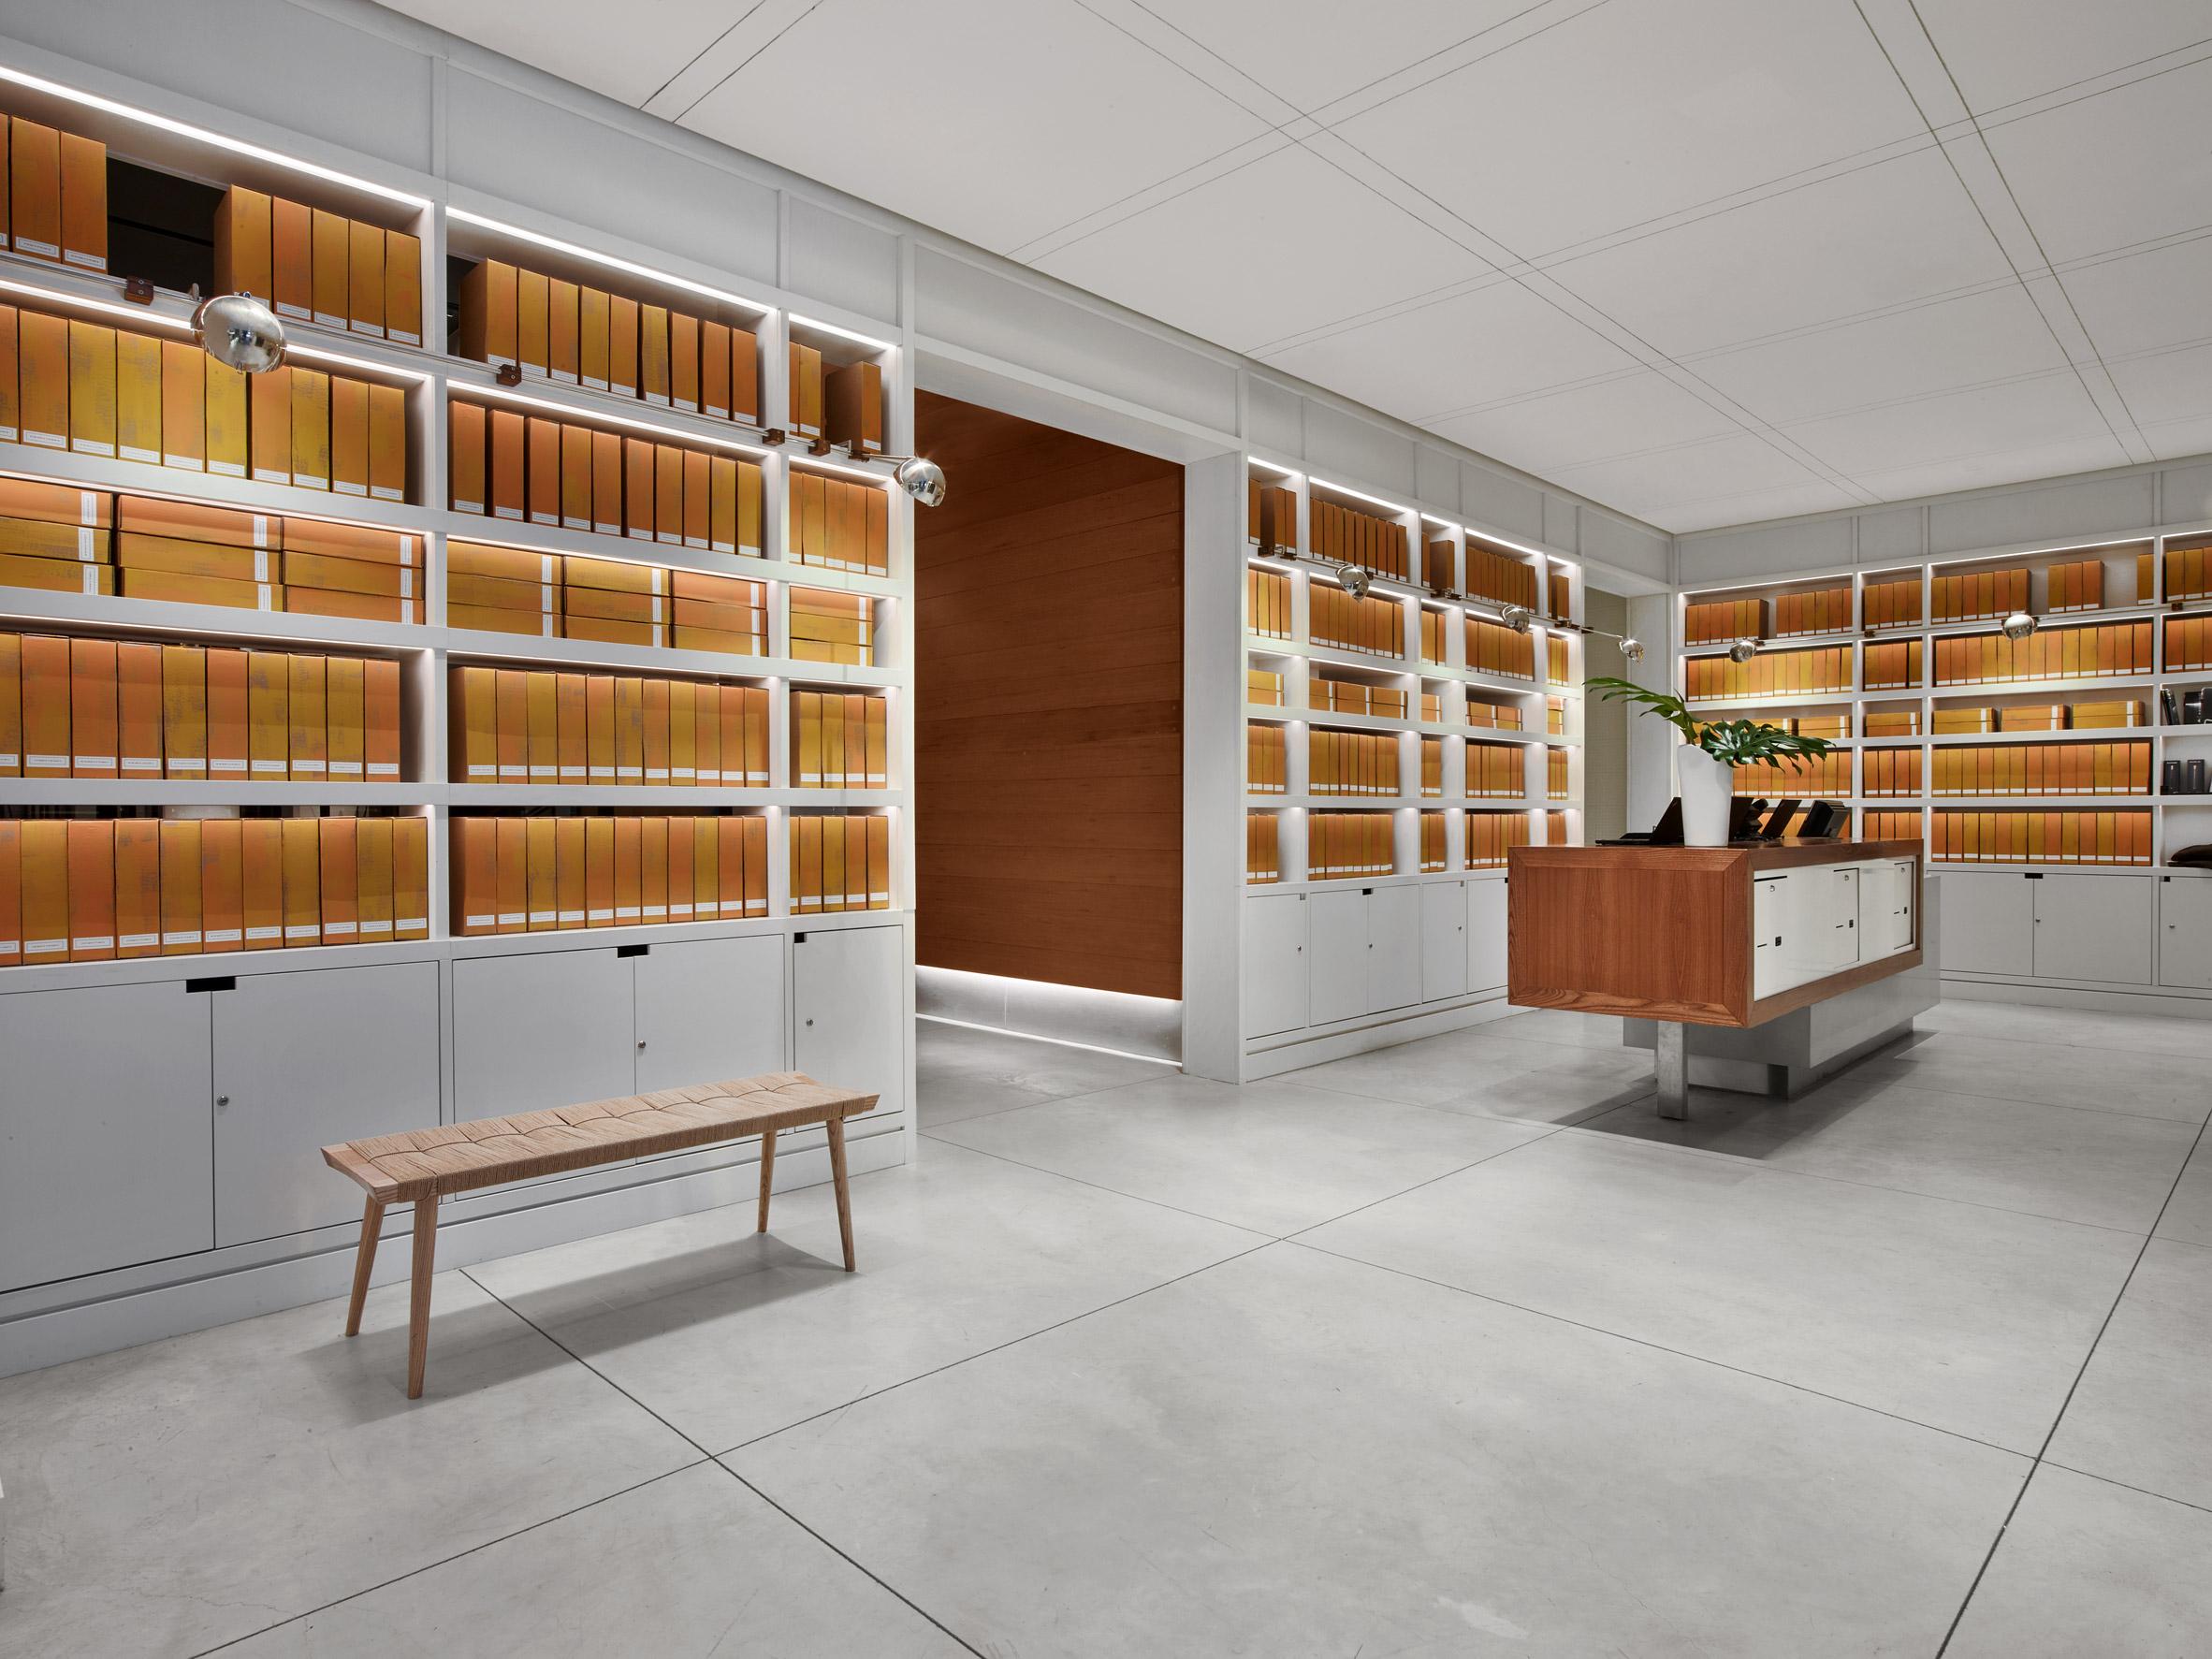 architecture-new-york-city-micro-hotel-design-studia-interiors-osnovadesign-osnova-poltava_17